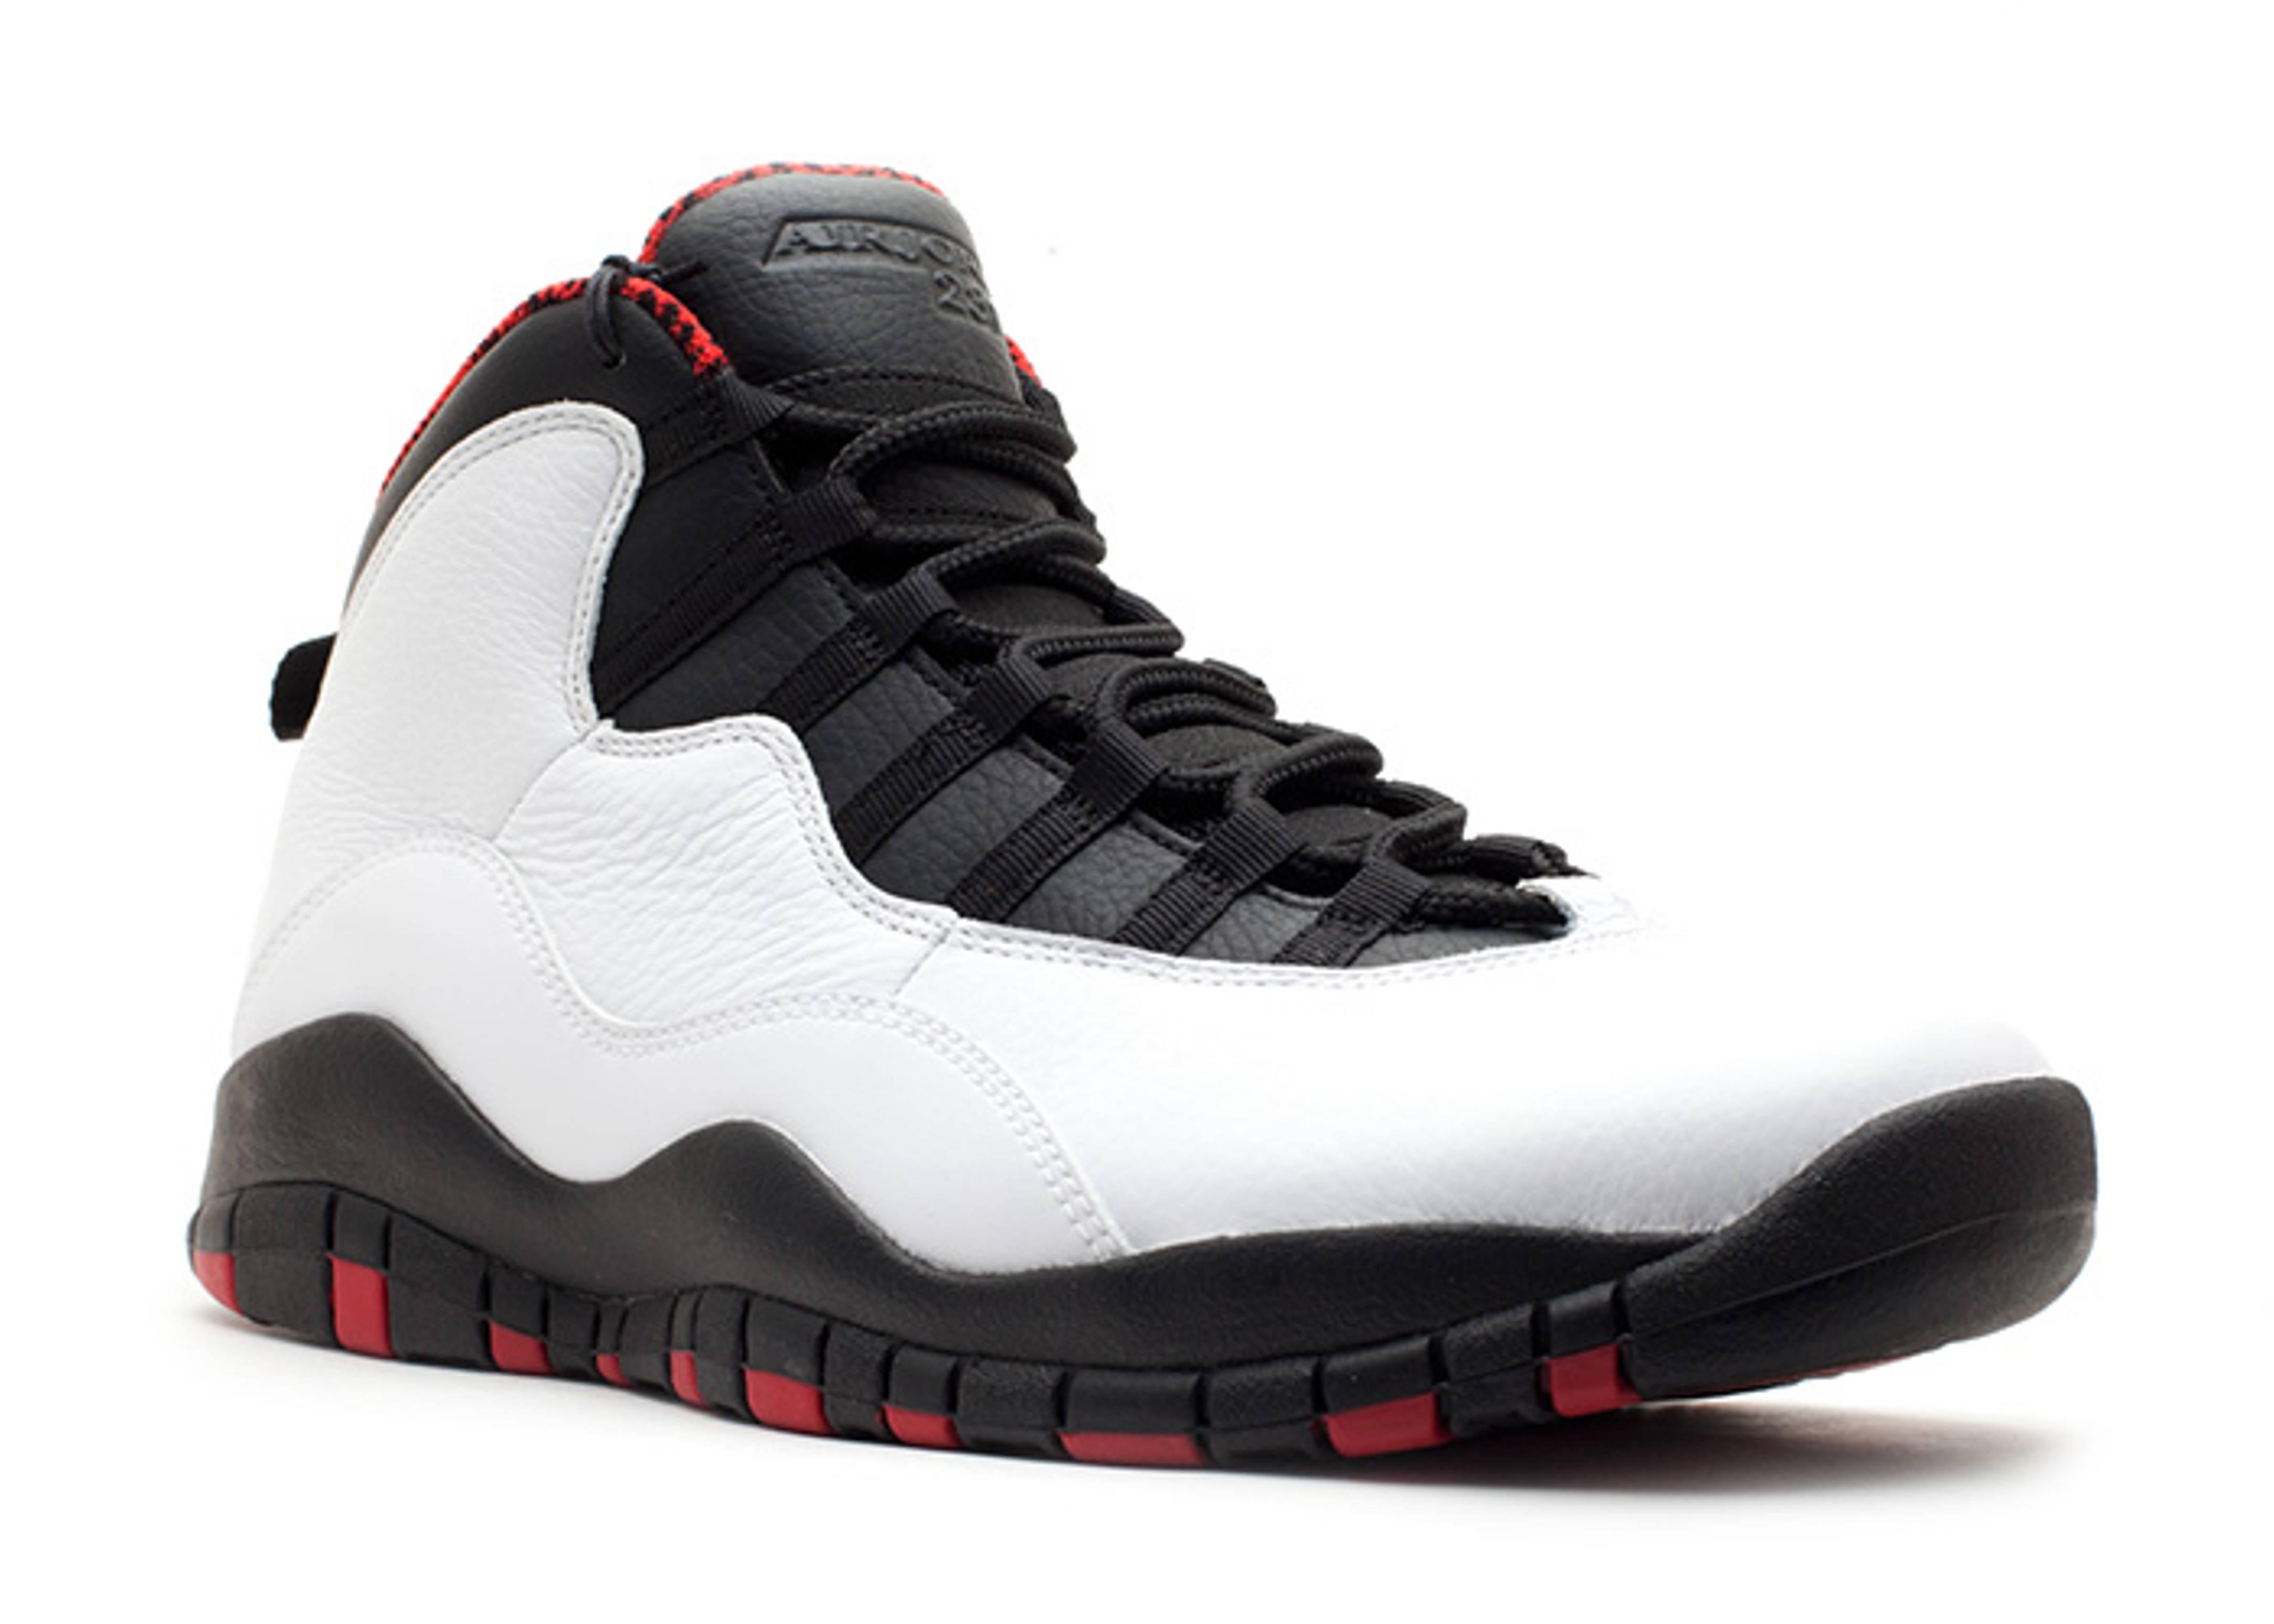 Air Jordan 10 Chicago